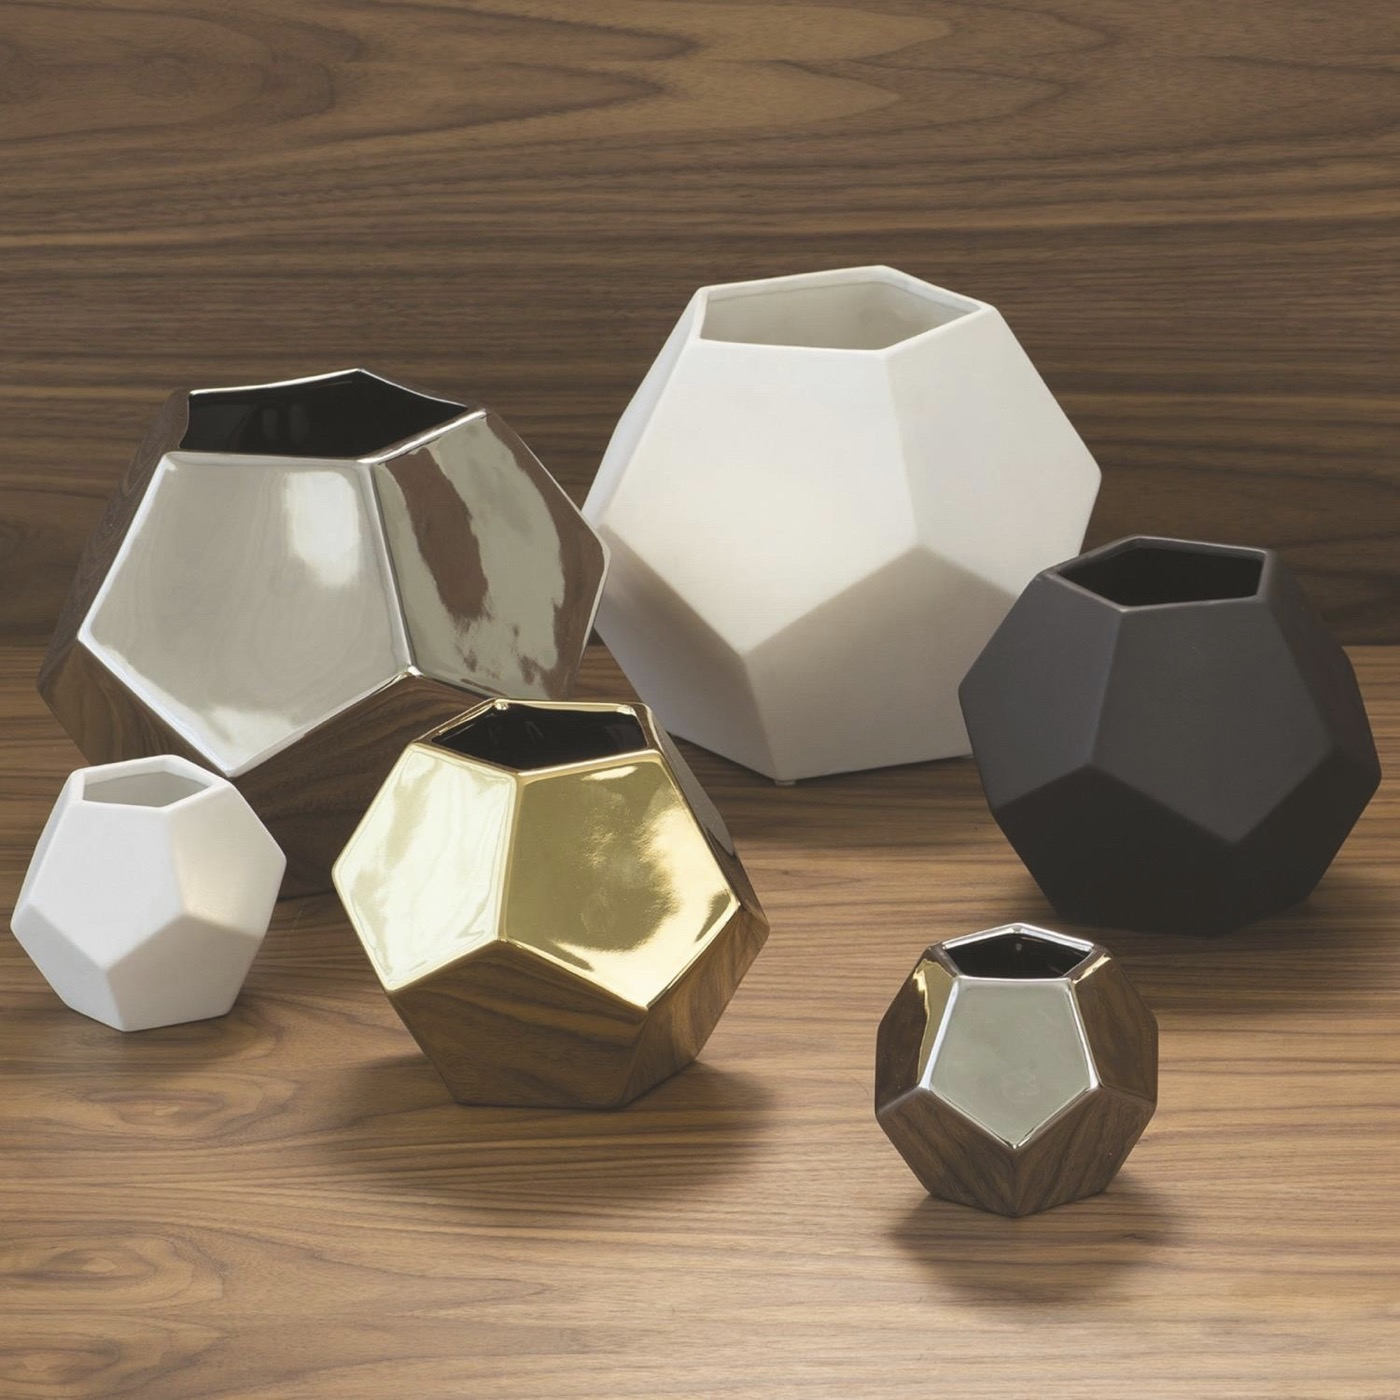 Perry Pentagonal Vases | White